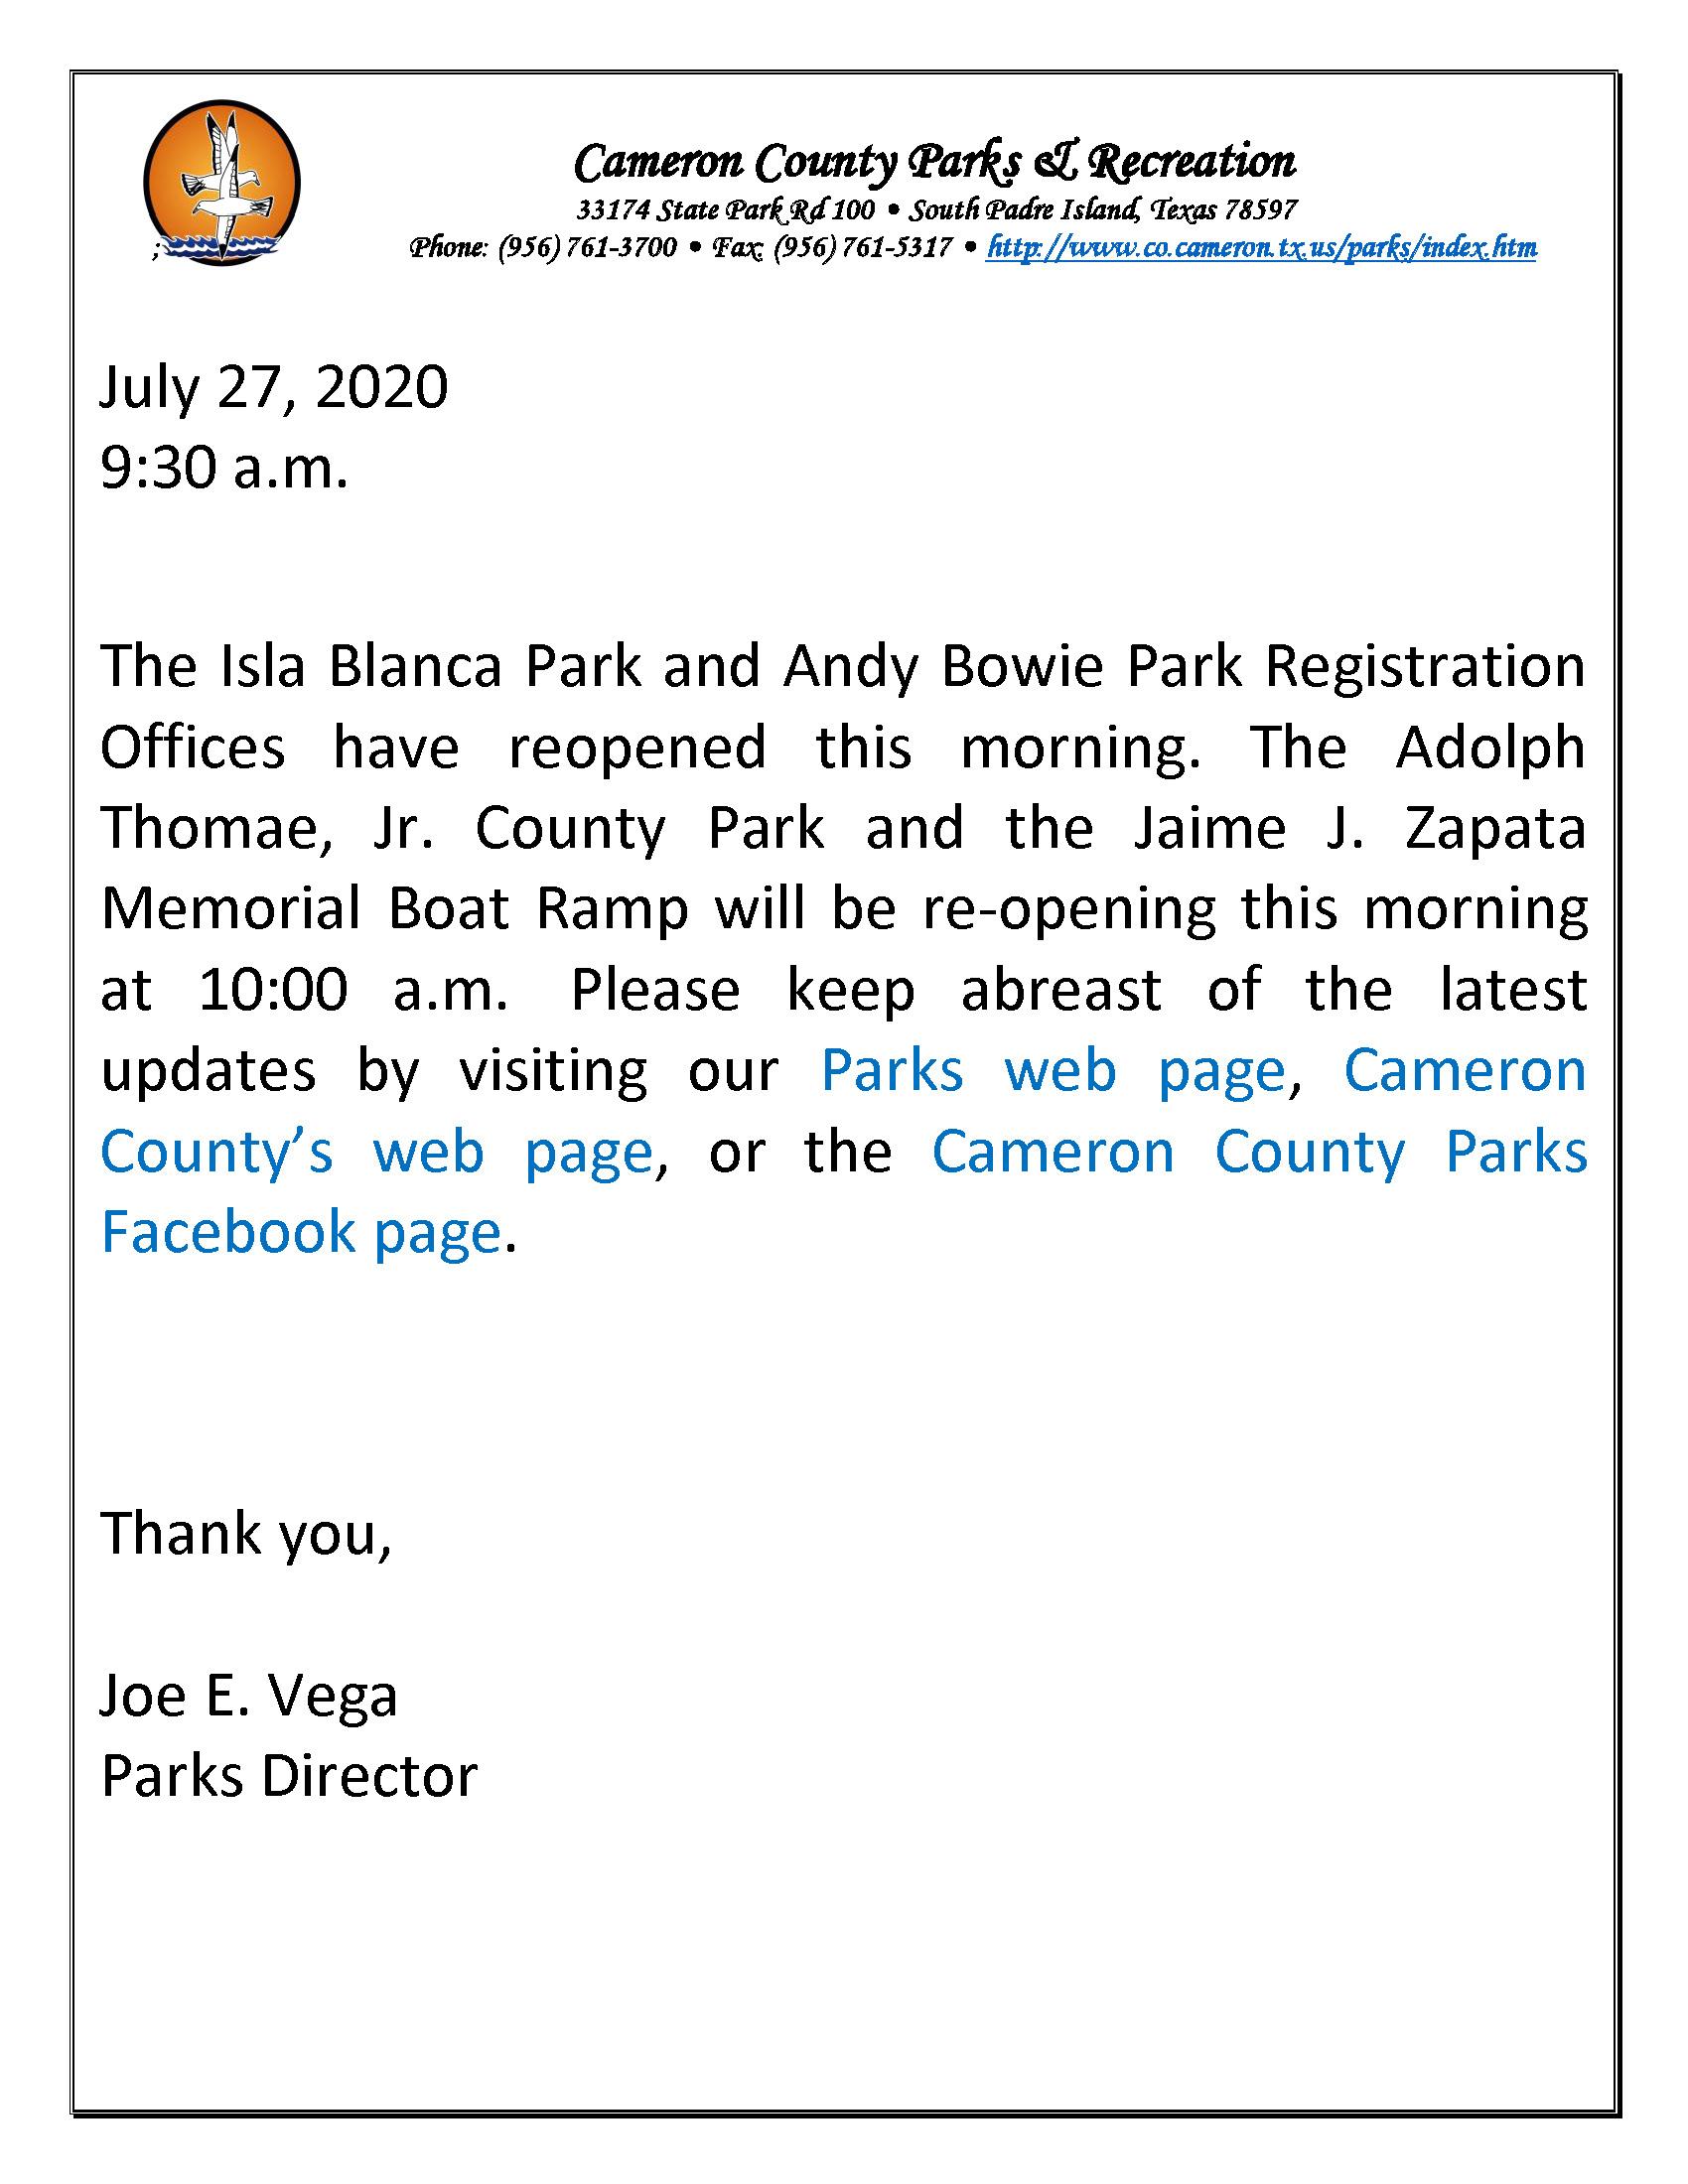 ADVISORY Reopening ATP JJZMBR  Parks Offices 7 27 20